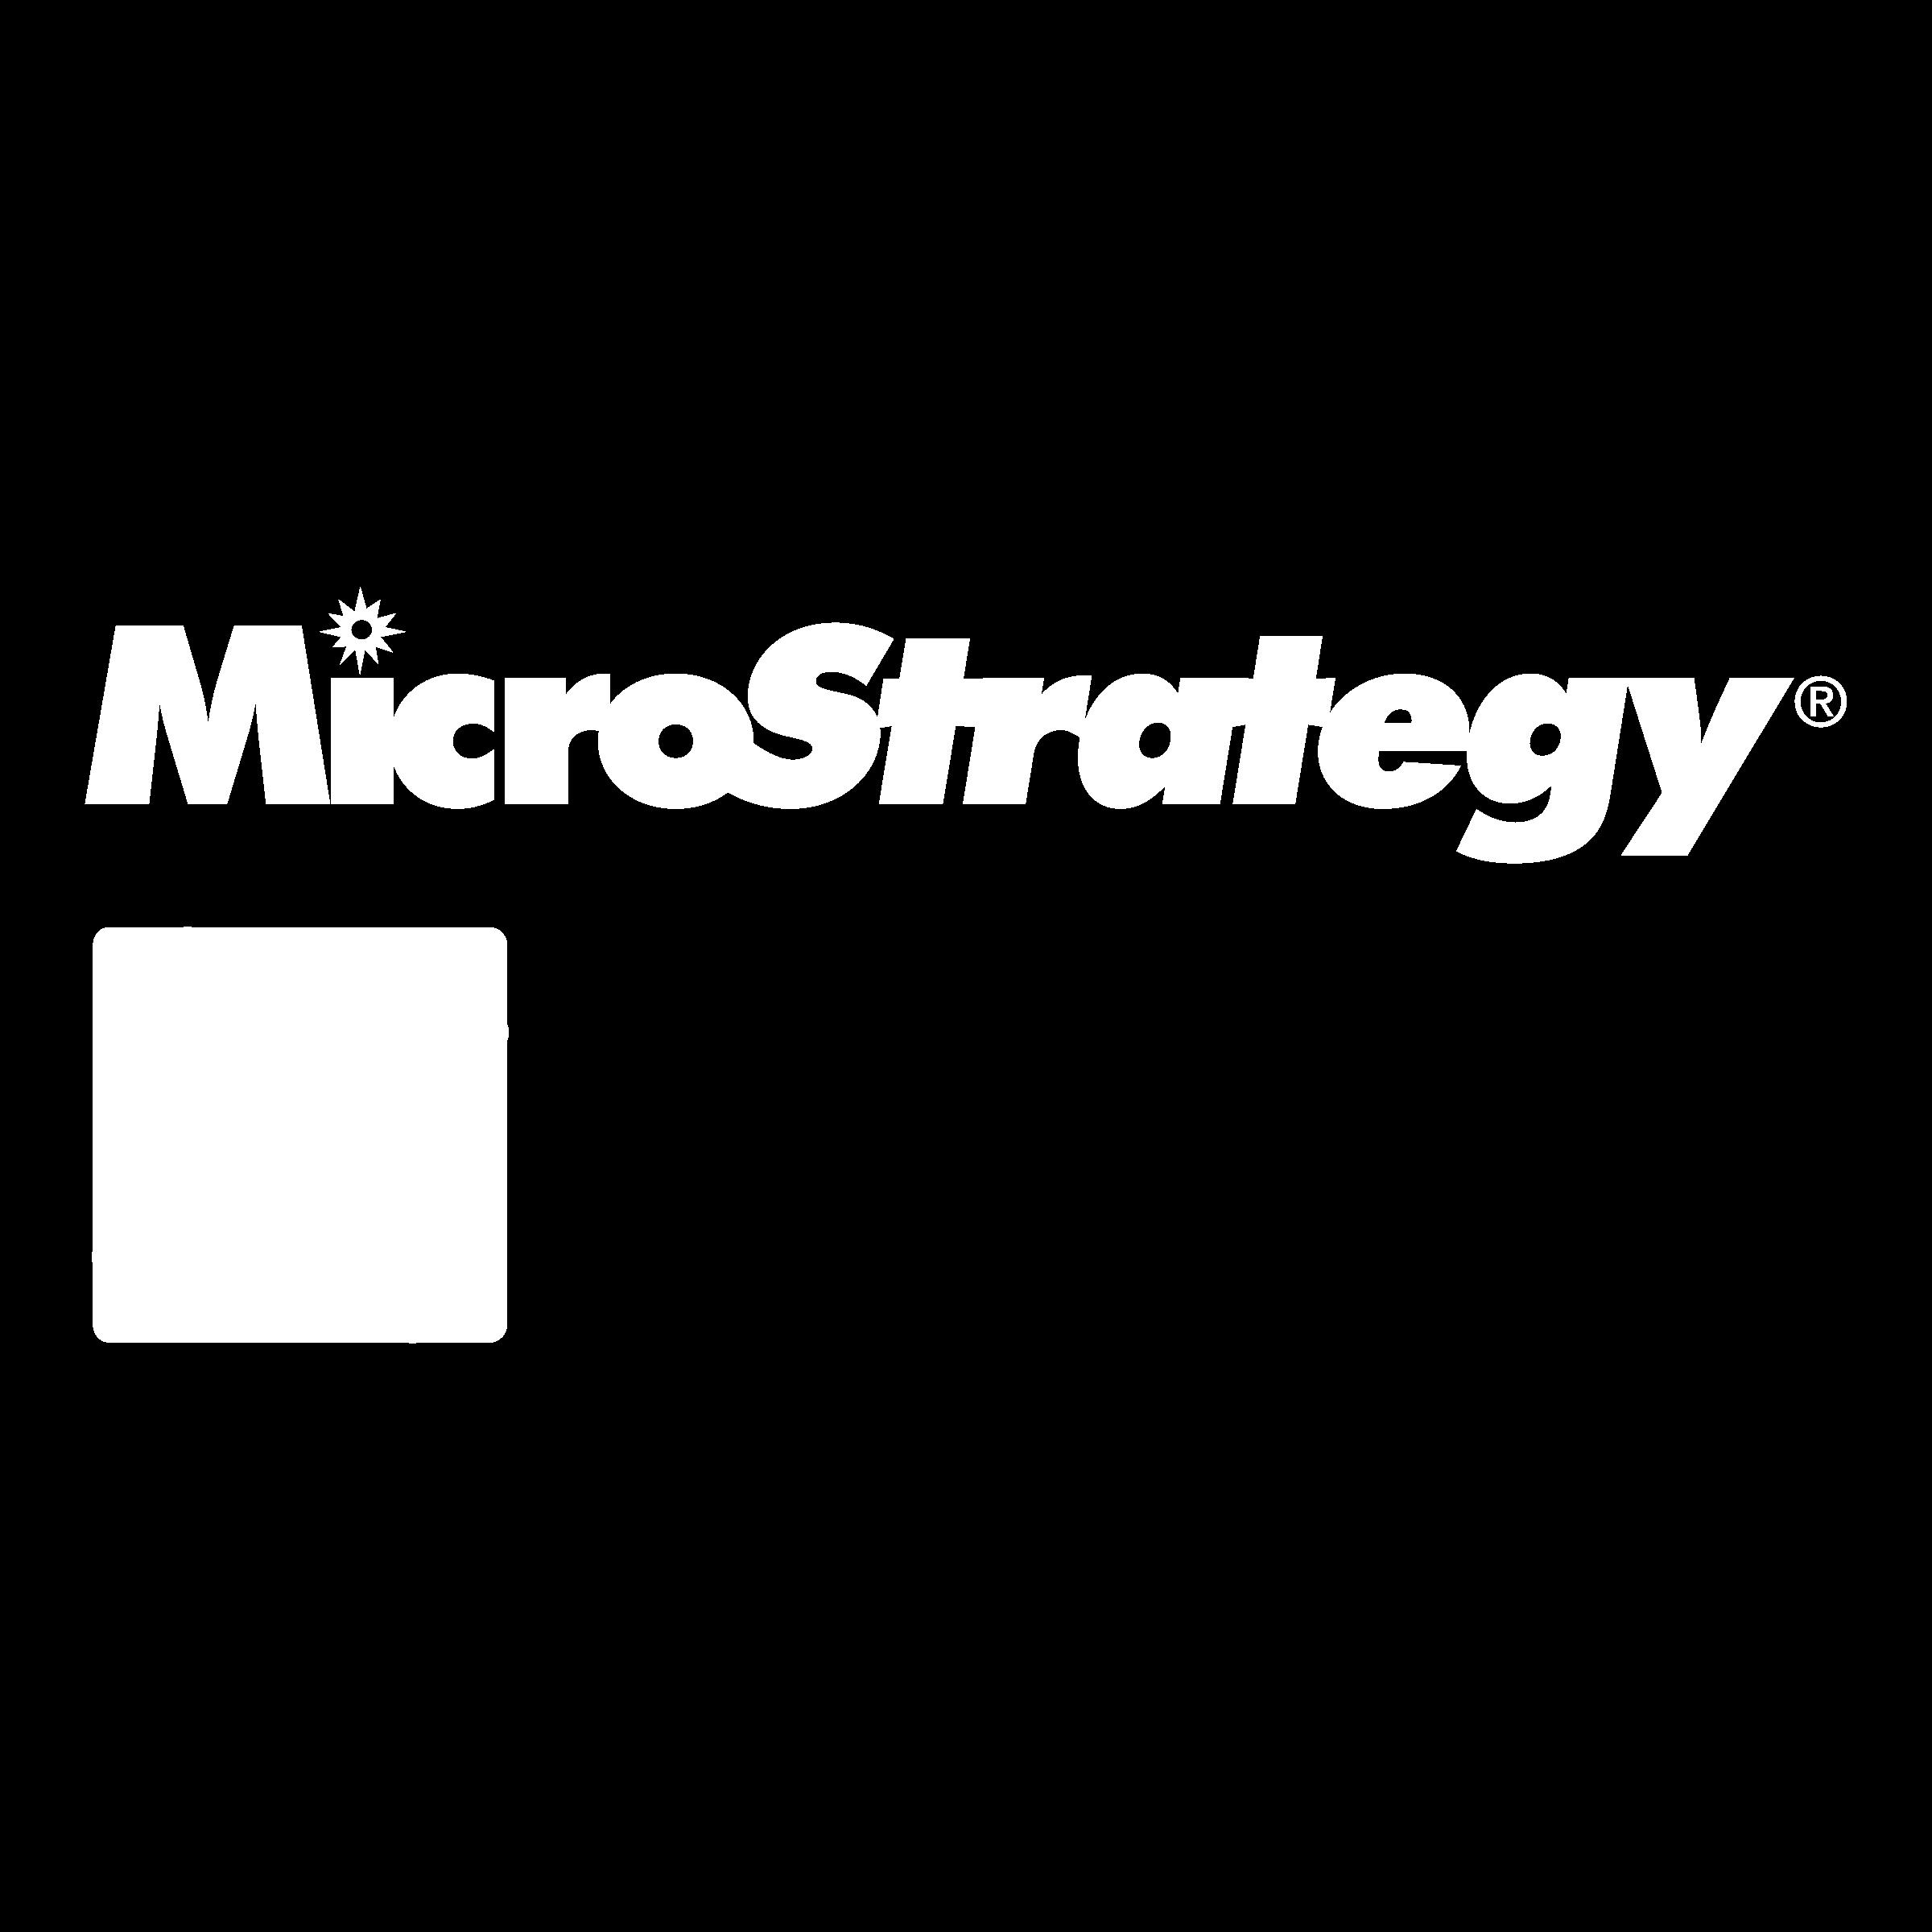 Web Logo PNG Transparent & SVG Vector - Freebie Supply